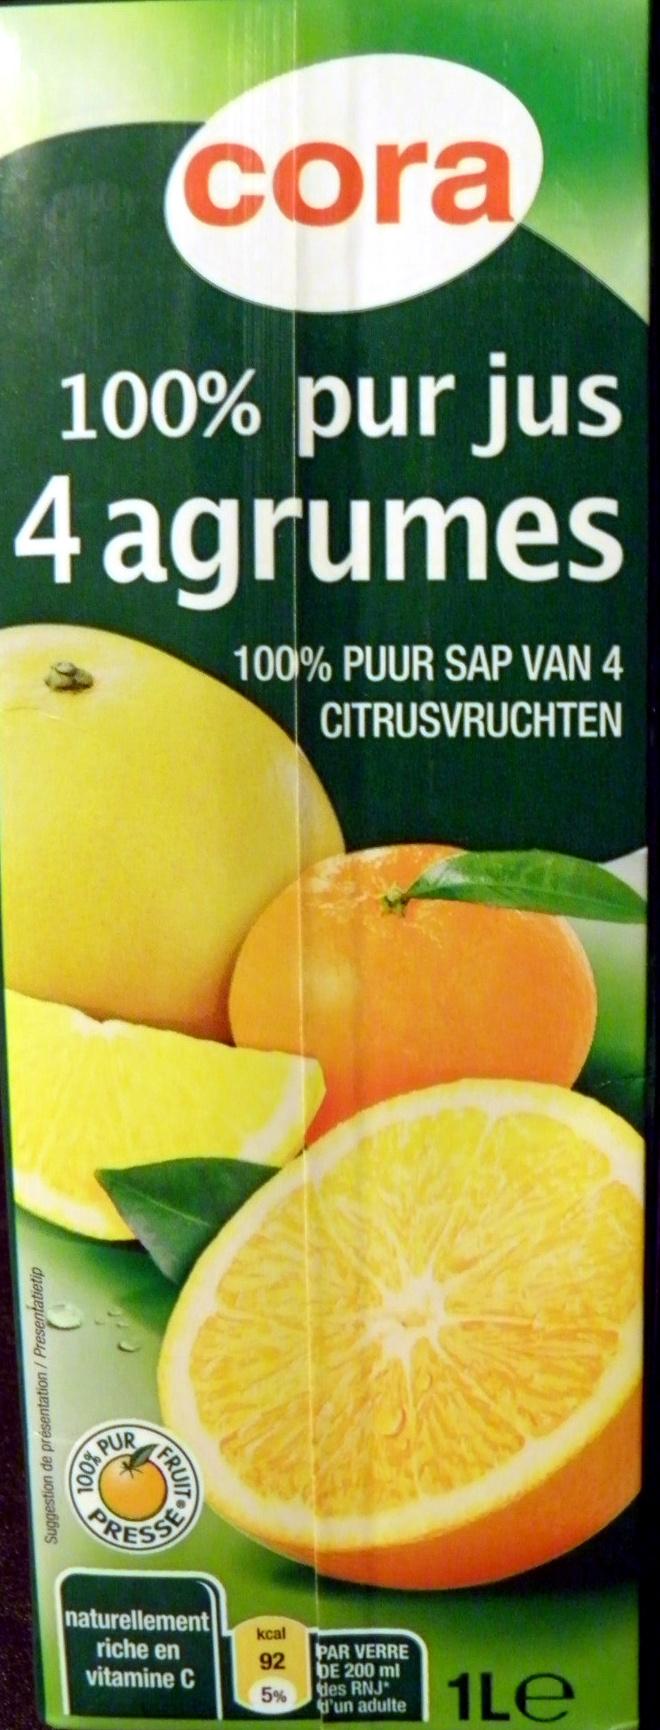 100 % pur jus 4 agrumes - Produit - fr